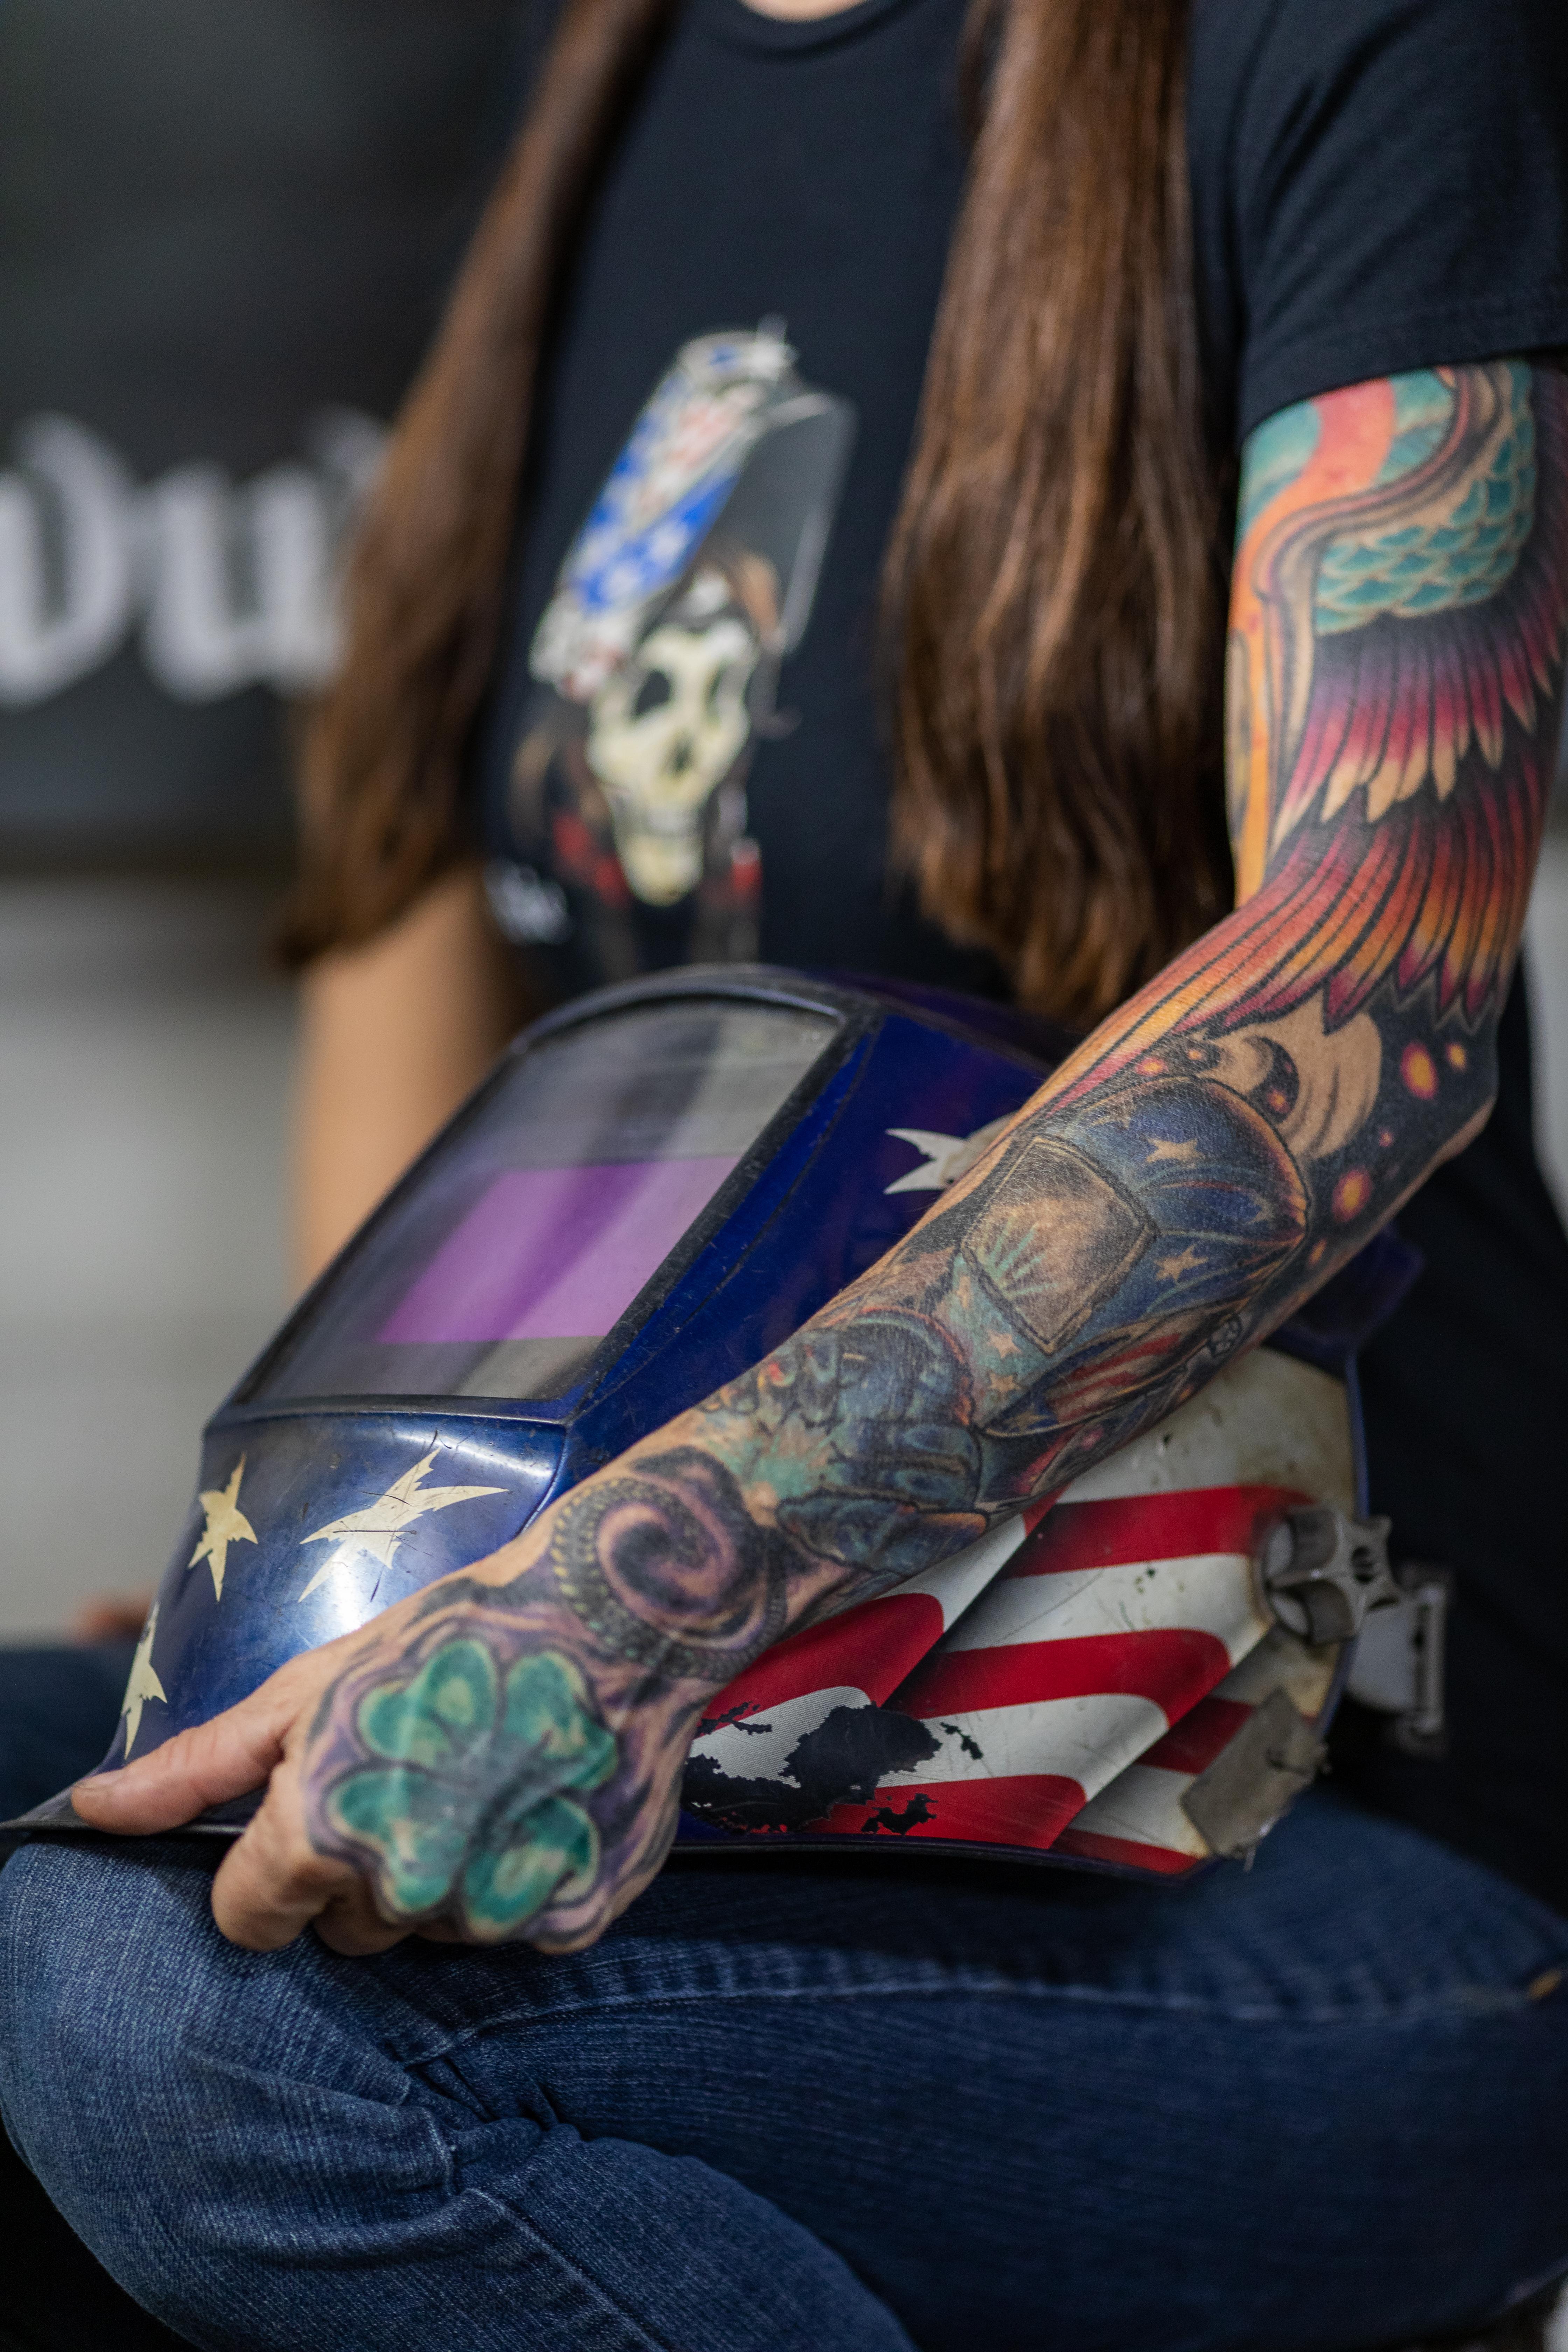 Barbie The Welder Sleeve Tattoo; Dusty Griffith Tattoorolo Corning, NY TIG Welding